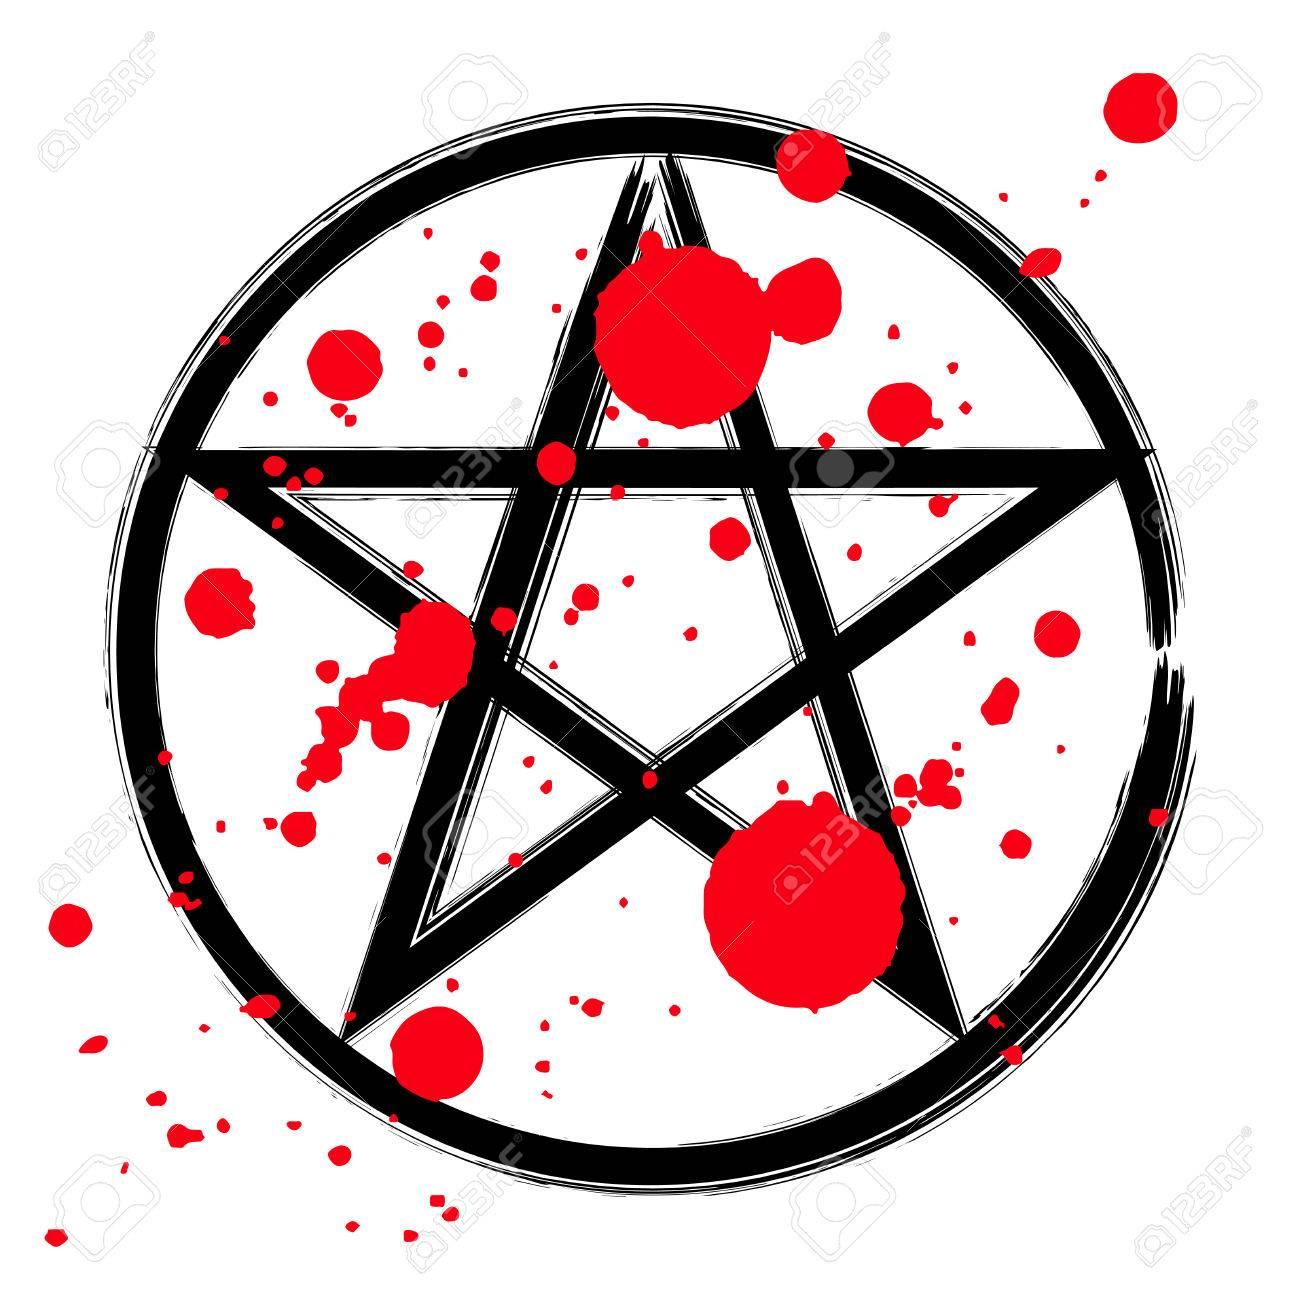 Pentagram icon brush drawing magic occult star symbol in a circle pentagram icon brush drawing magic occult star symbol in a circle with drops of blood biocorpaavc Choice Image